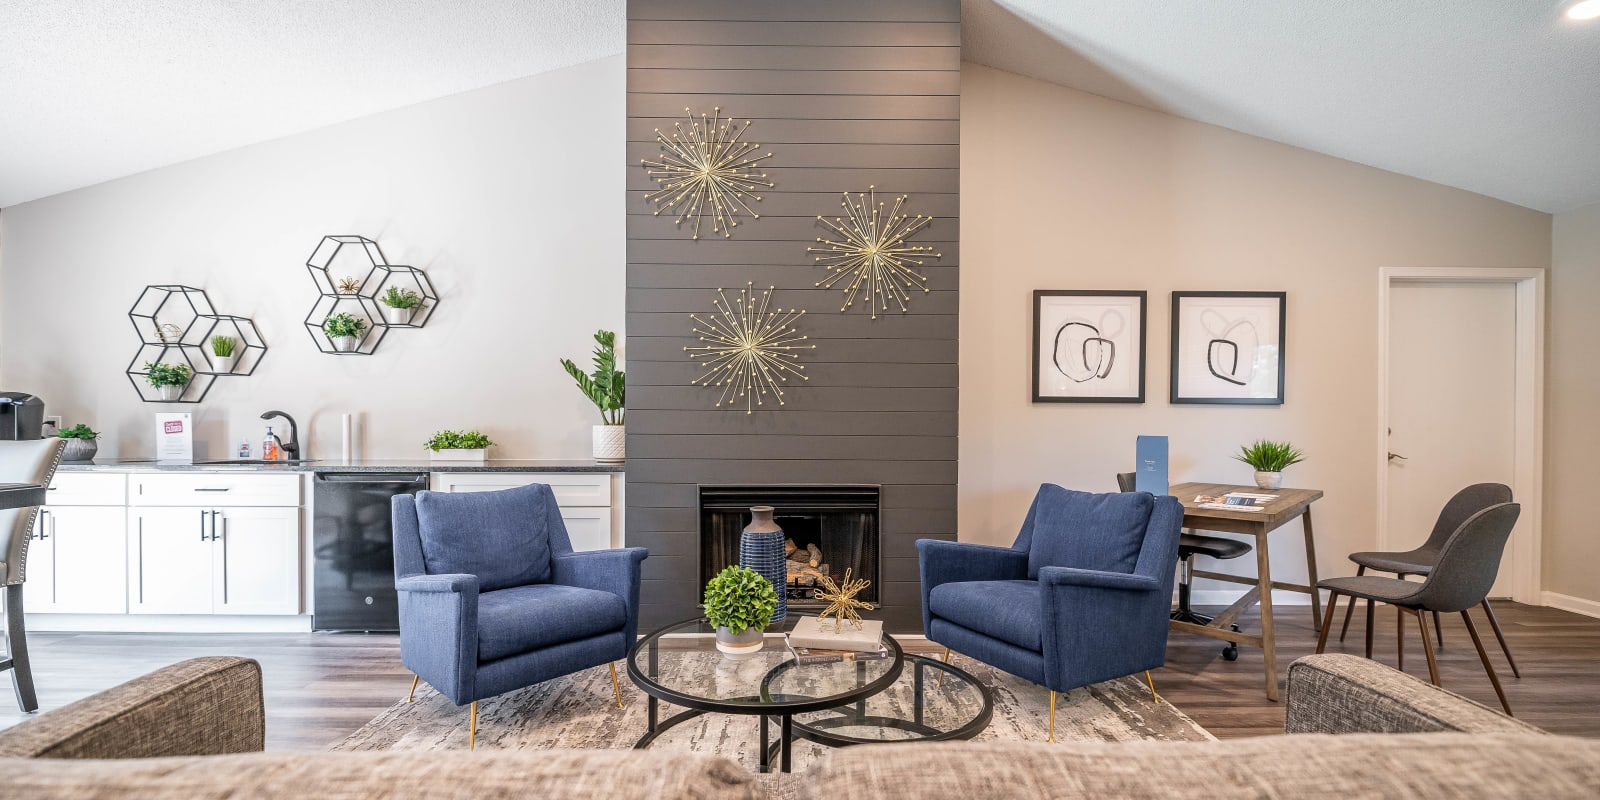 Spacious clubhouse with comfortable seating at Kannan Station Apartment Homes in Kannapolis, North Carolina